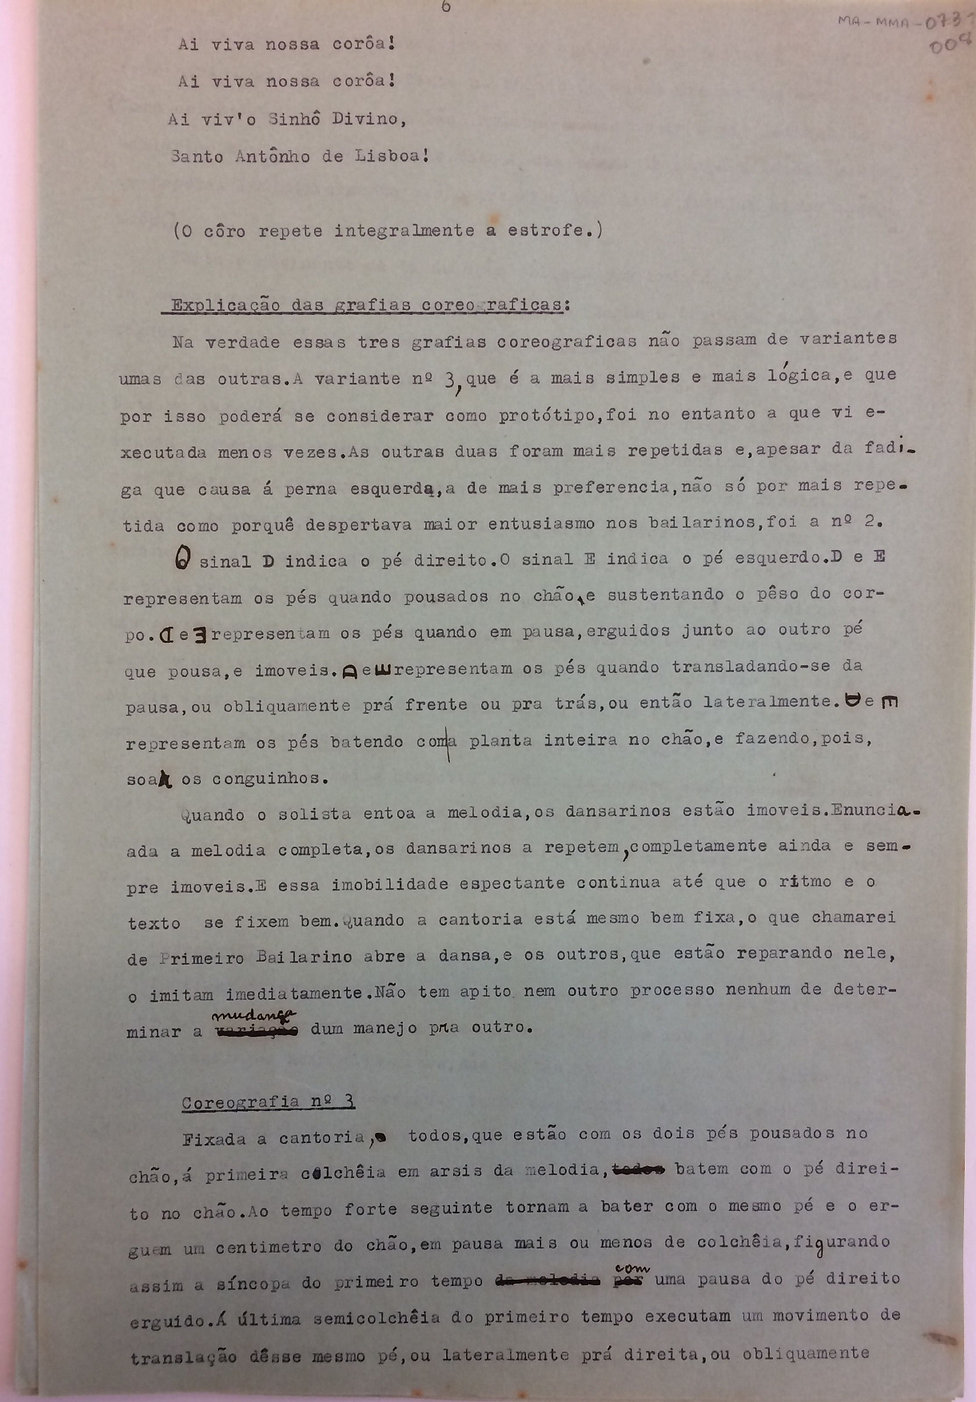 Moçambique_Sta_Isabel_(Mogi)_page-0007.j